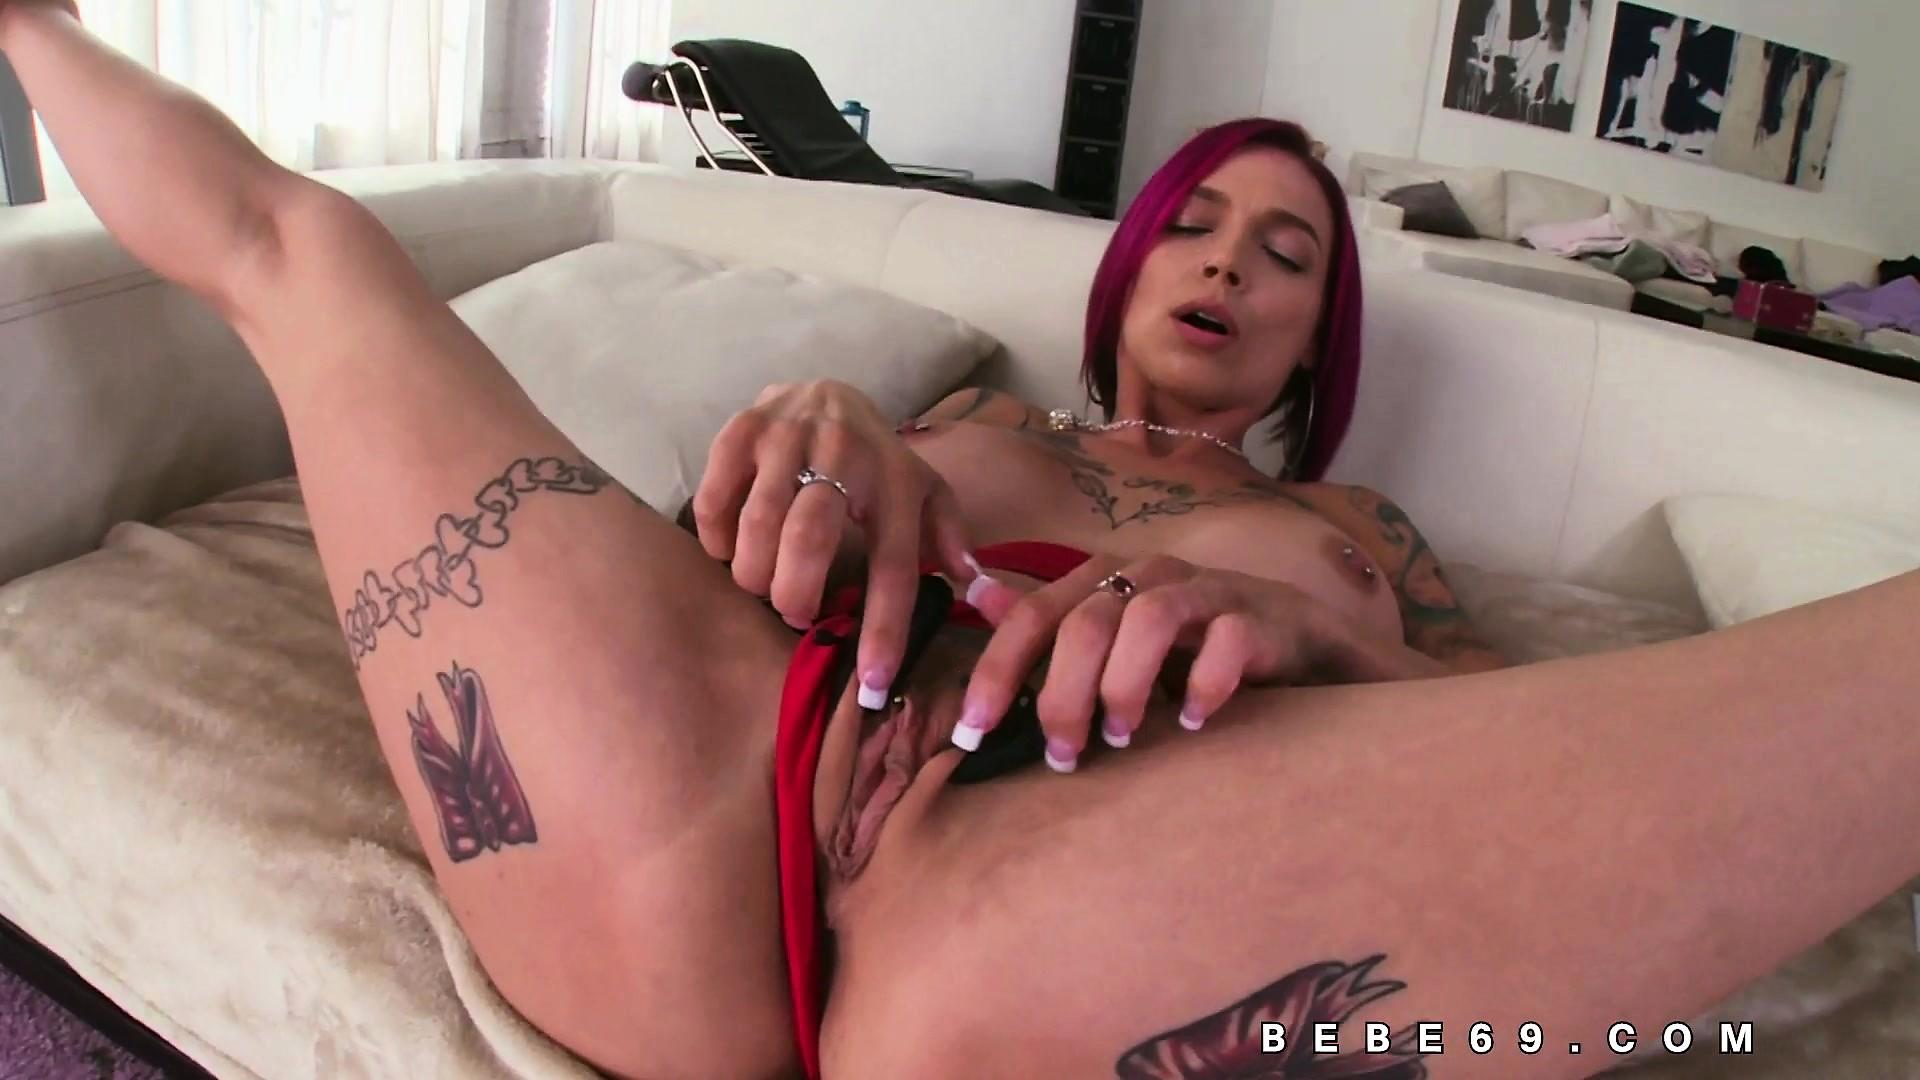 Sex video of female celebrity